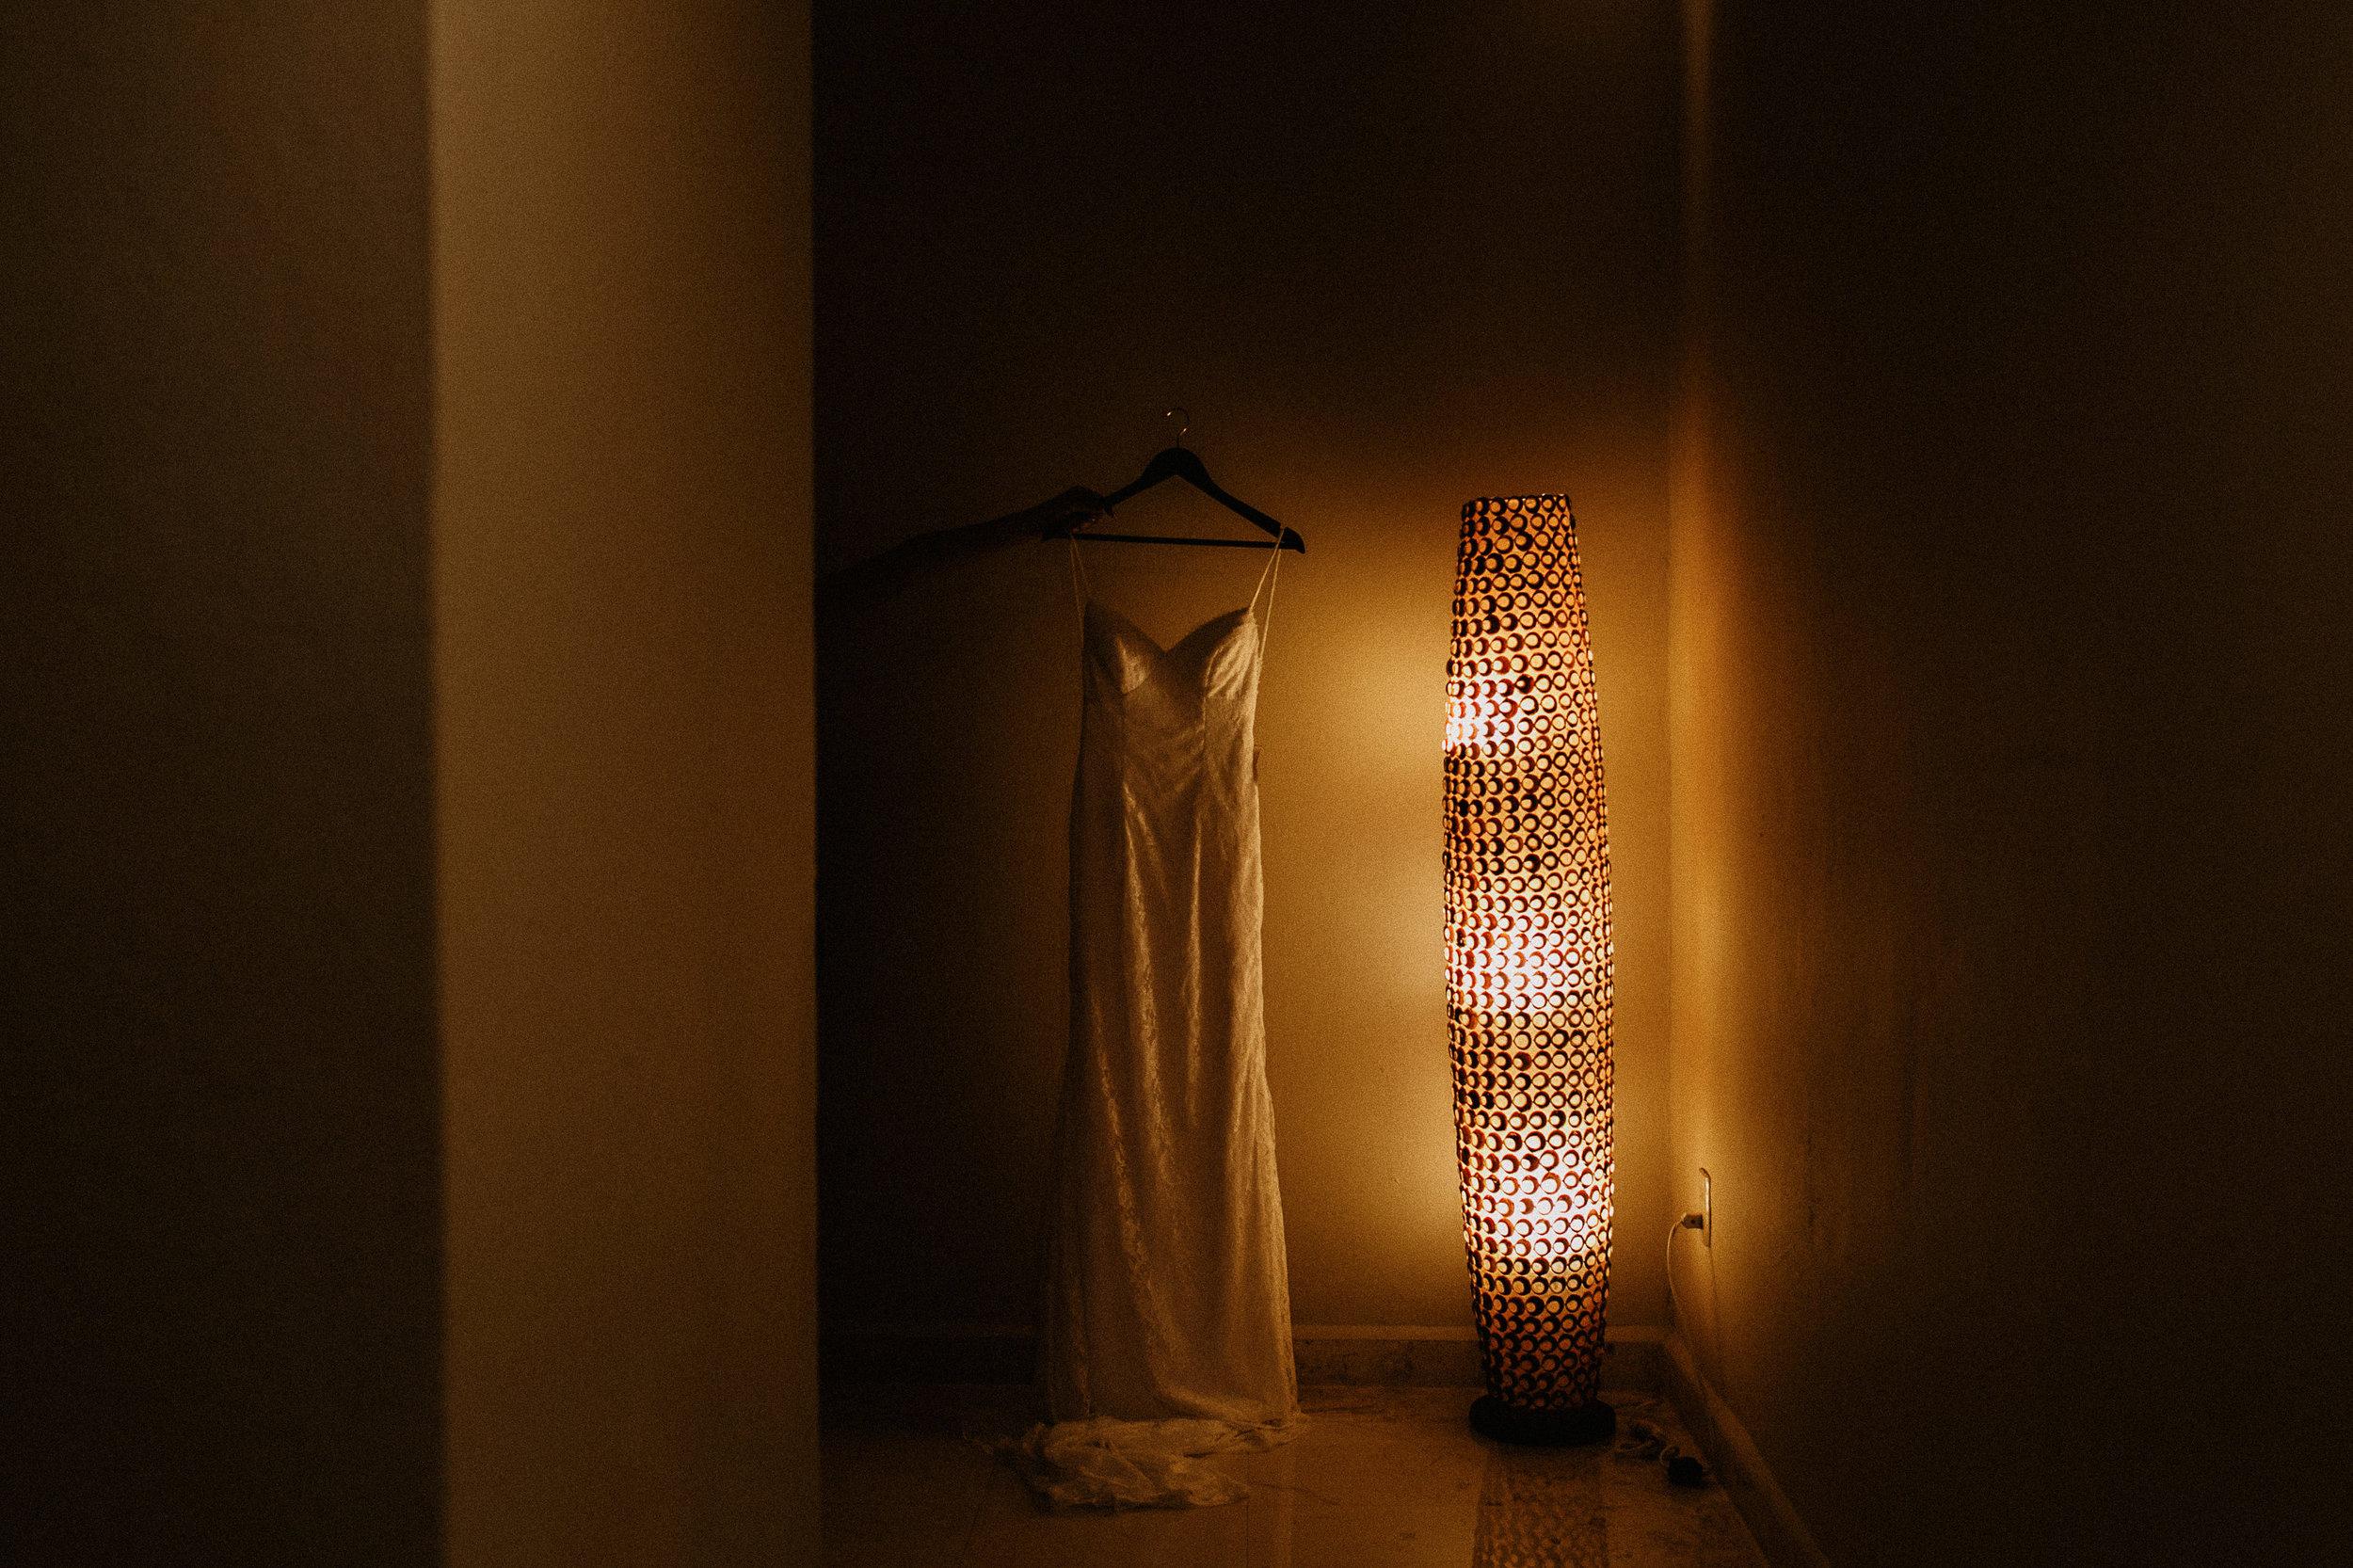 alfonso_flores_destination_wedding_photography_puerto_vallarta_hotel_barcelo_vallarta_cuttler_amela-69.JPG